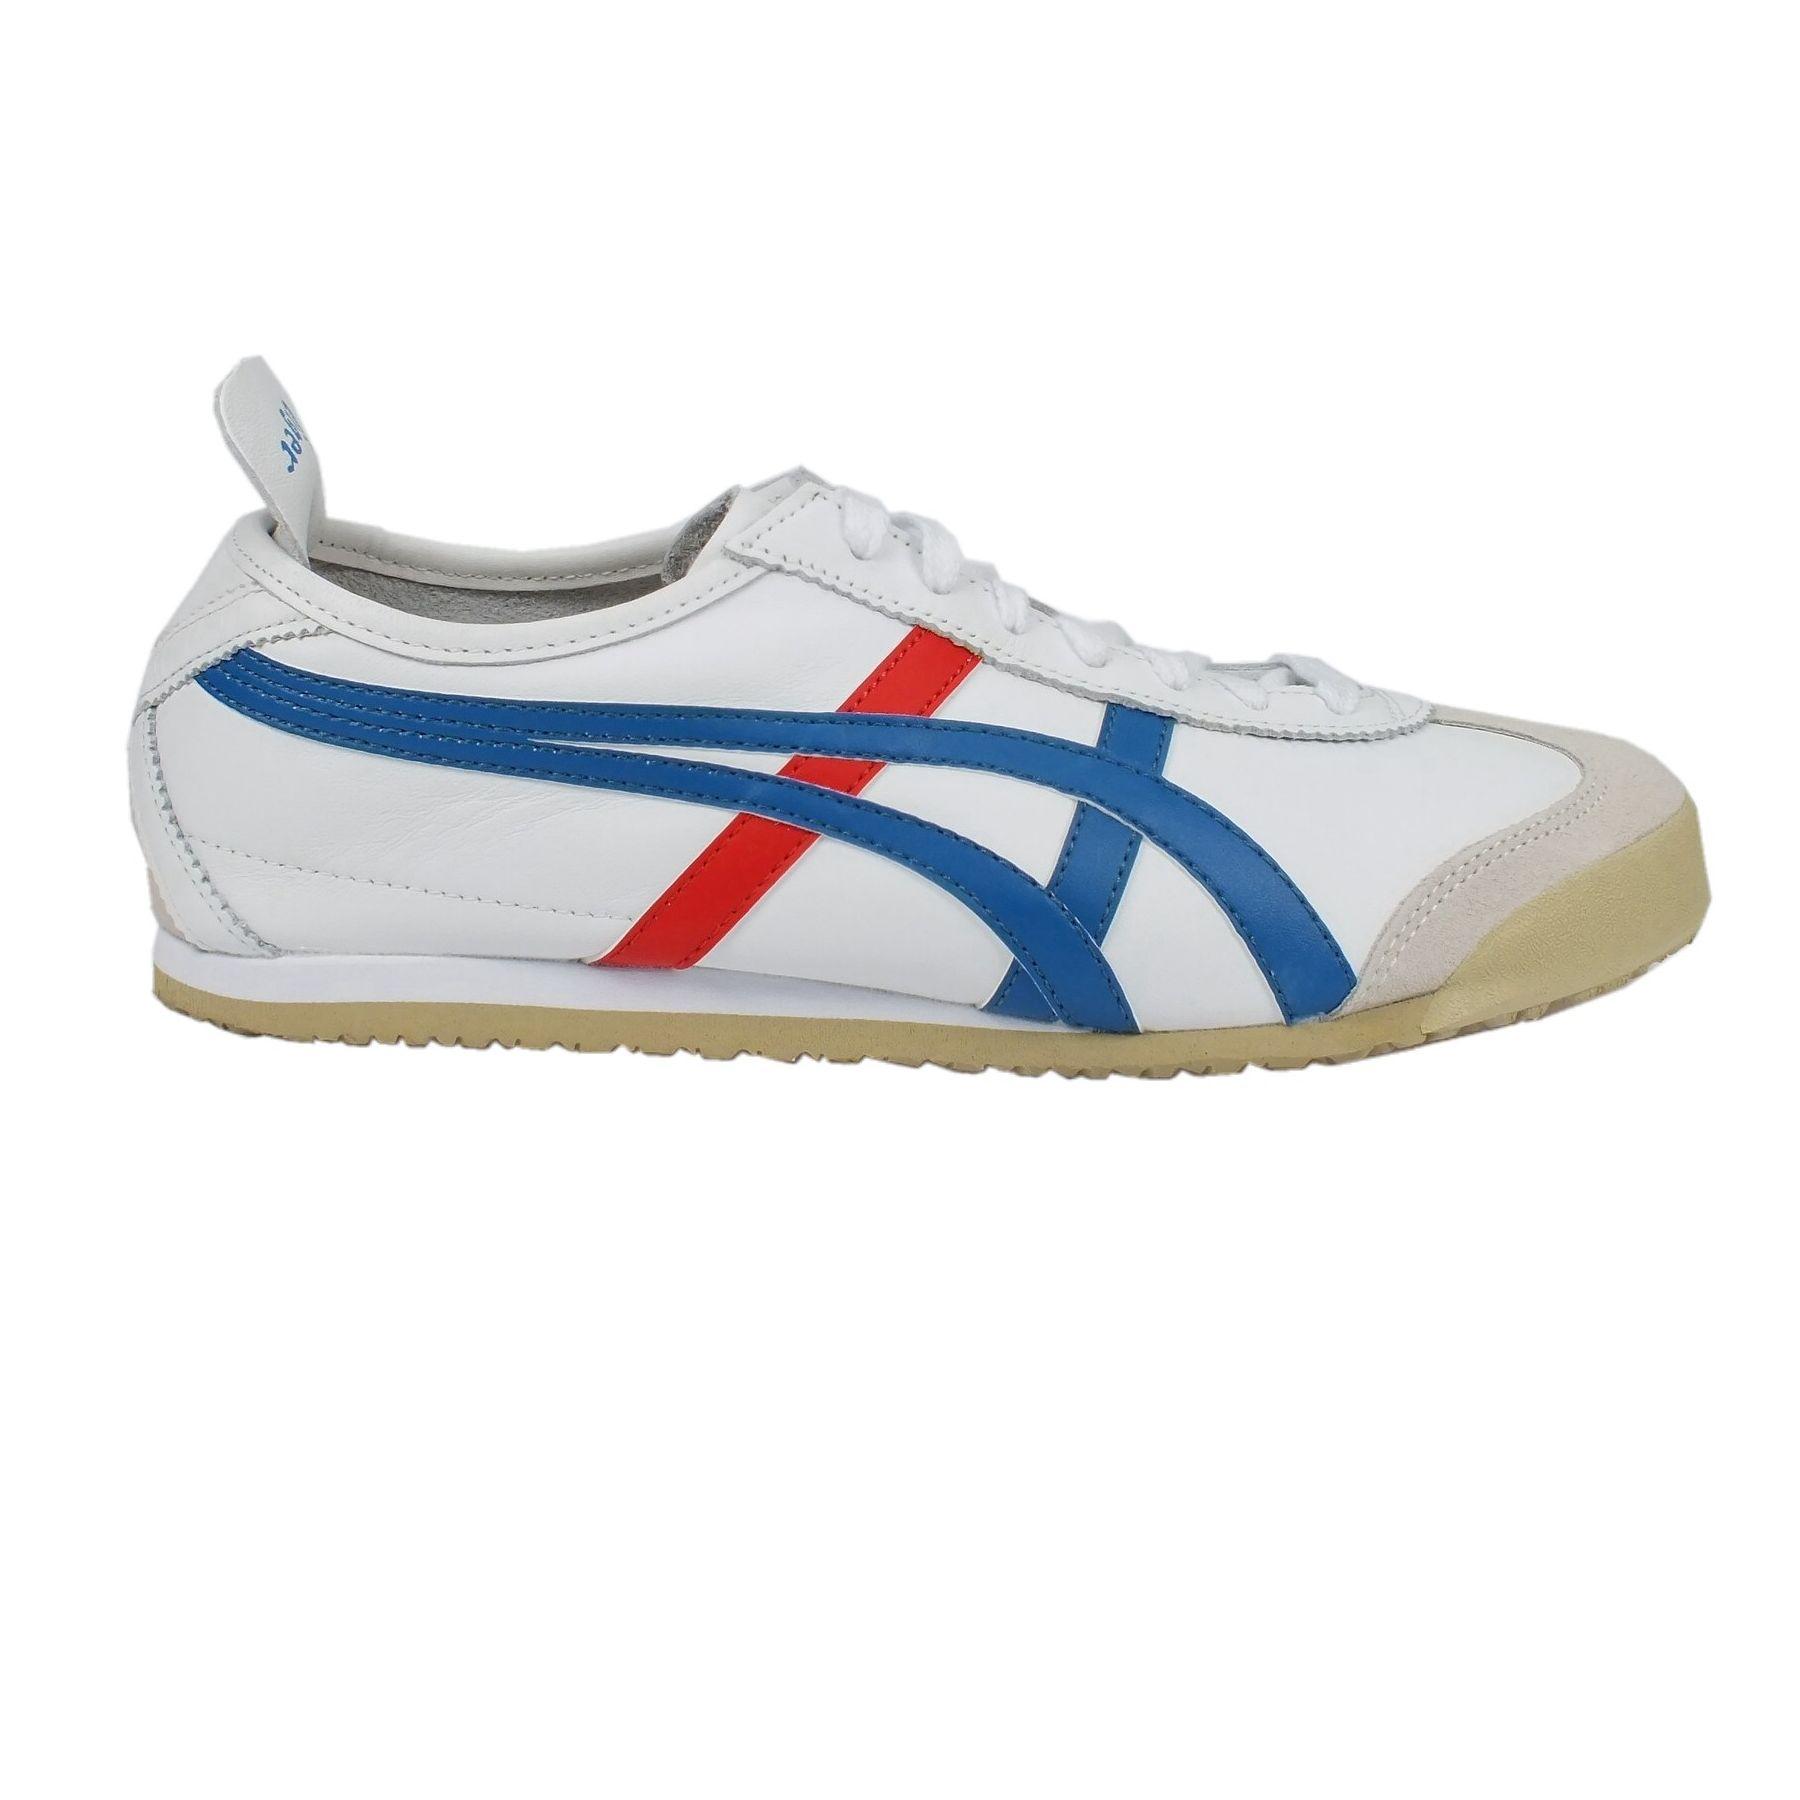 Asics-Onitsuka-Tiger-Mexico-66-Schuhe-Turnschuhe-Sneaker-Damen-Herren